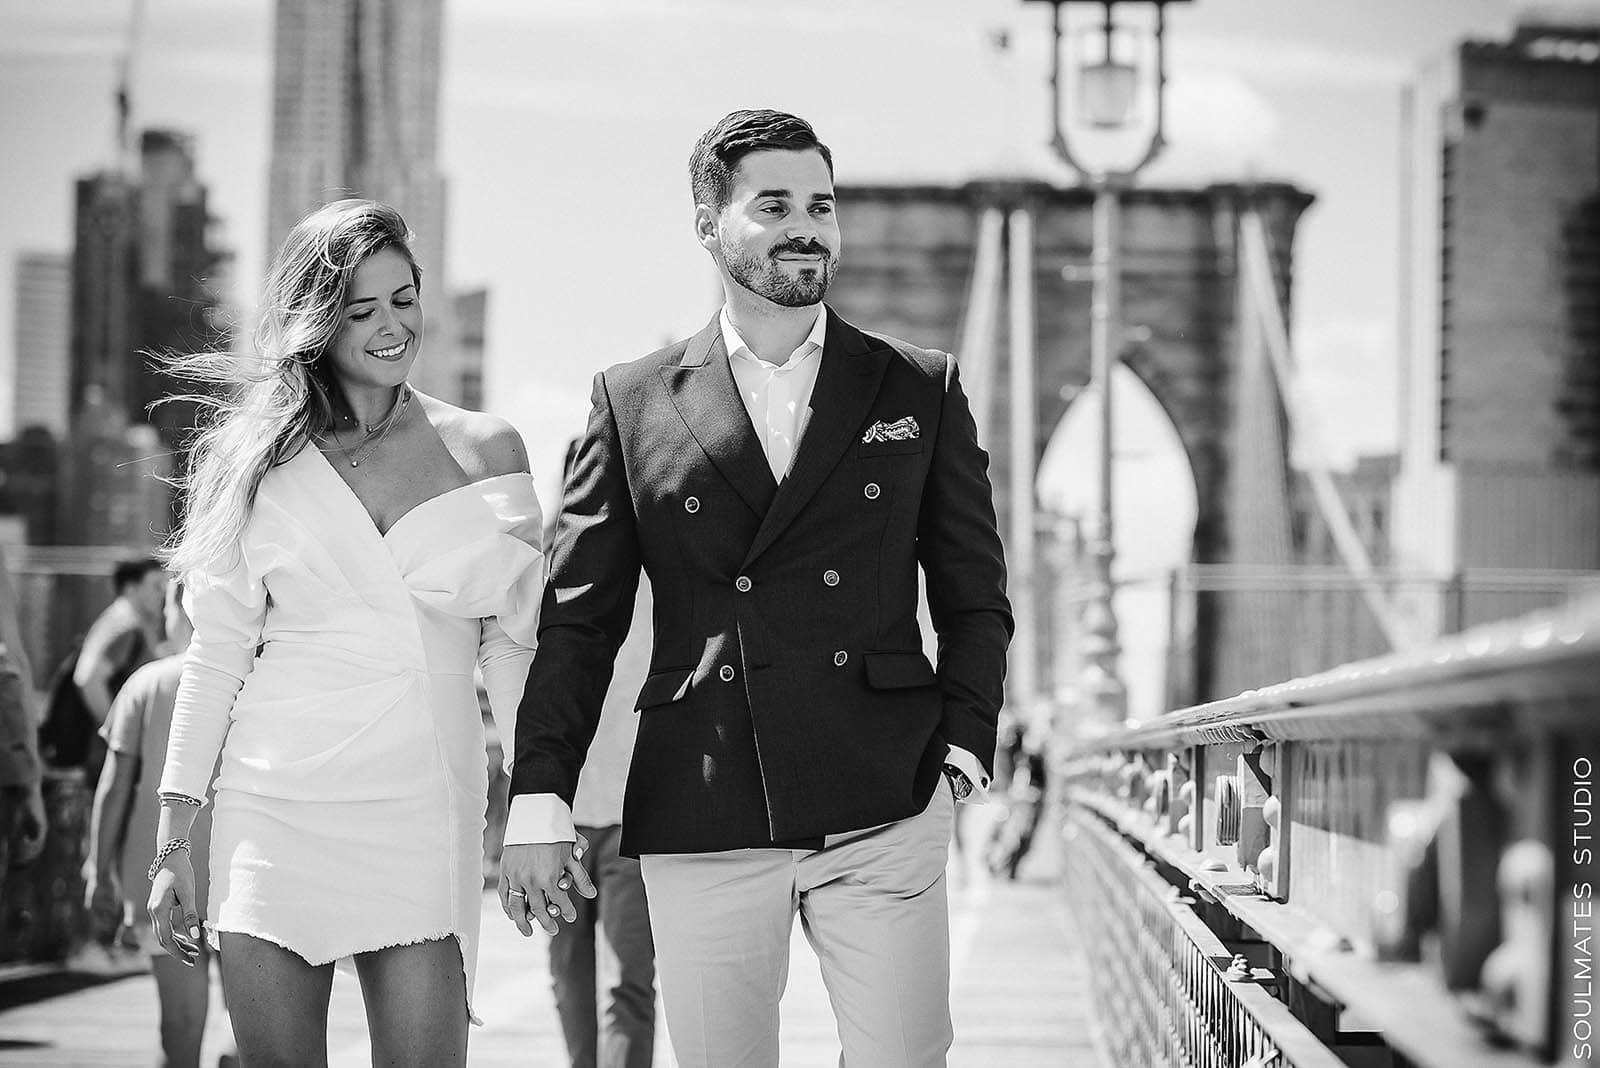 Couple smiling on the Brooklyn Bridge